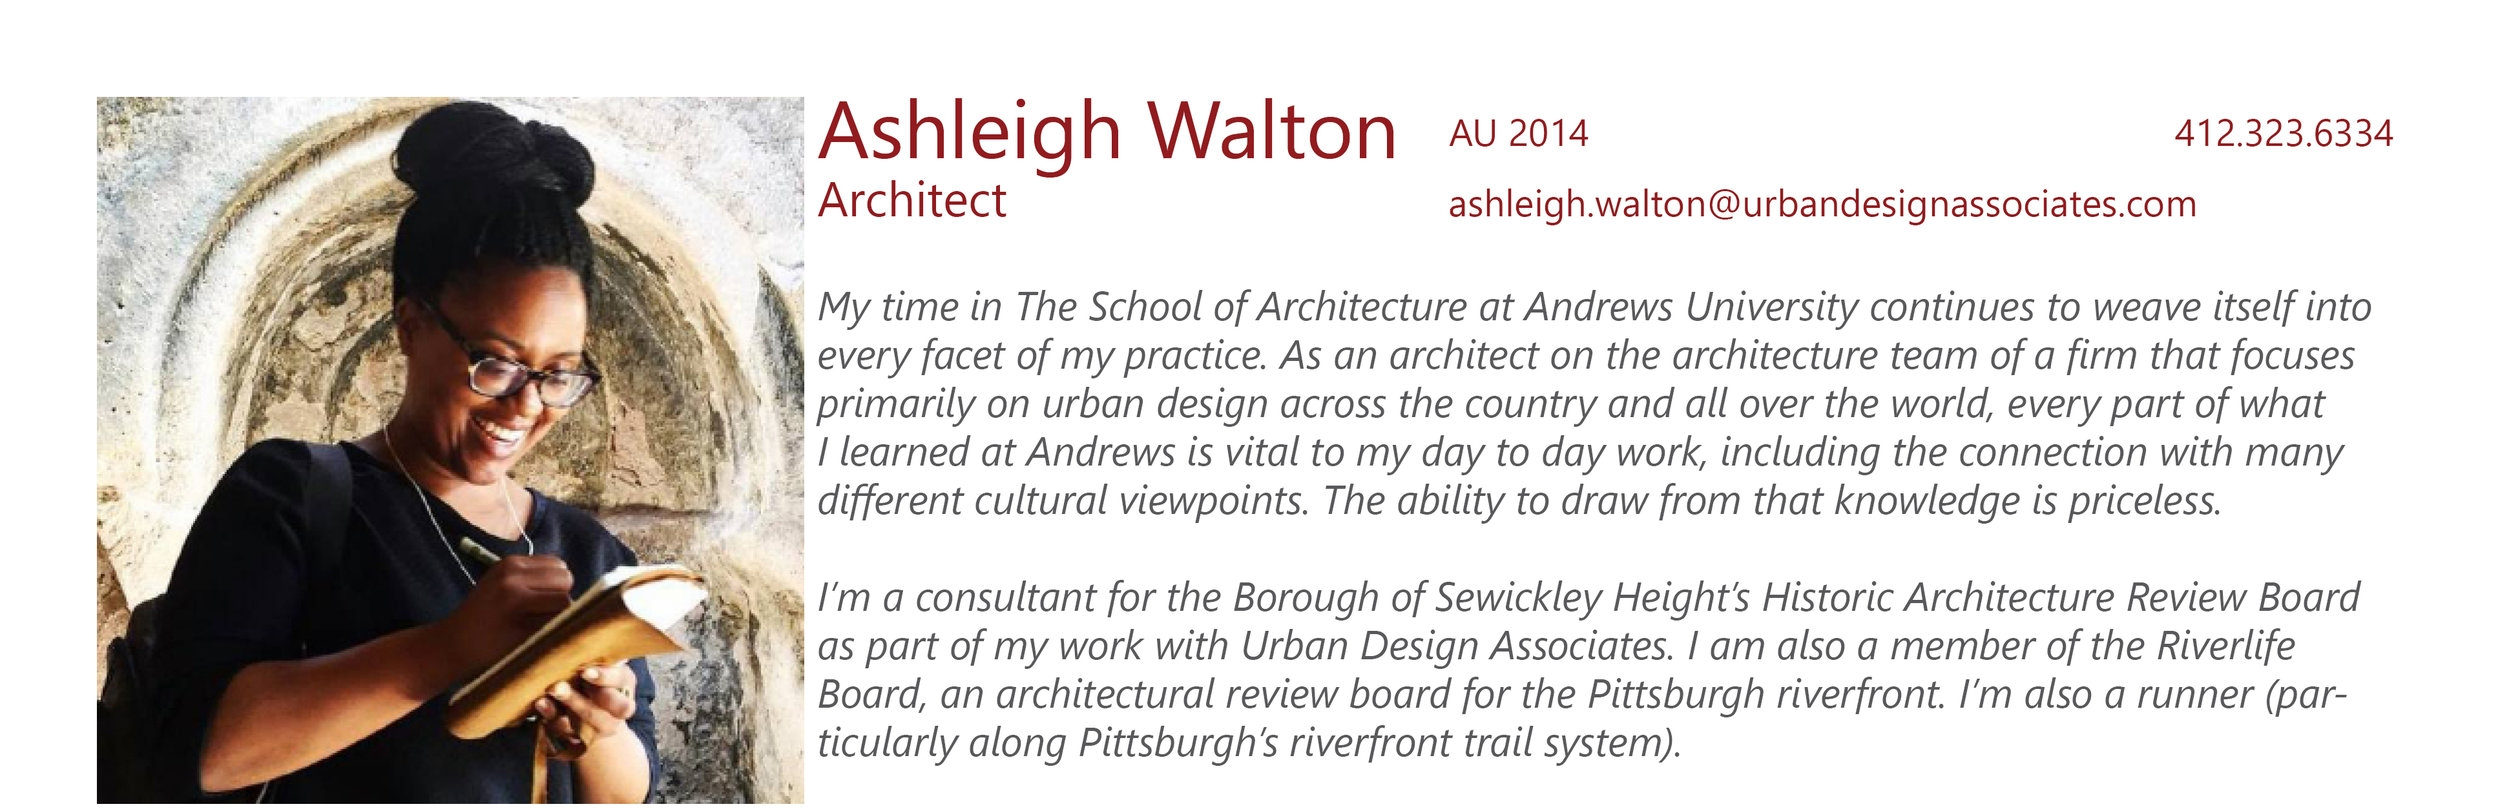 Ashleigh Walton.jpg